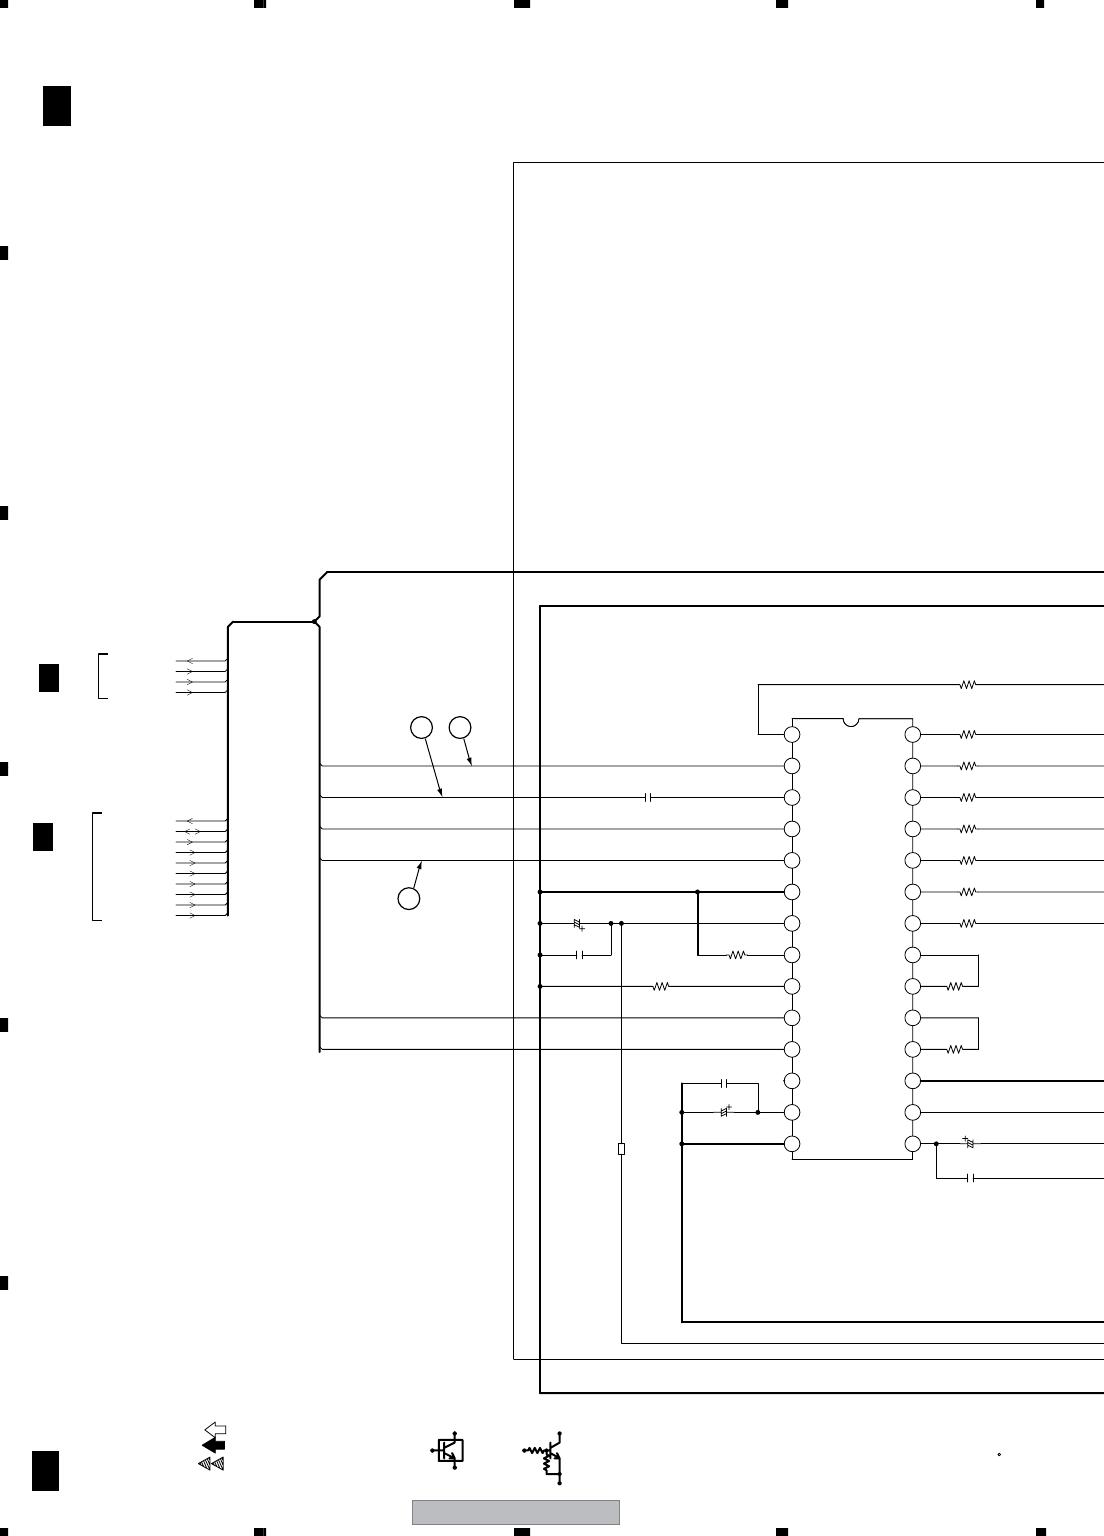 R3140 Last Dvr Rt501 S Rt401 Rrv3140 Cdg Relay Wiring Diagram